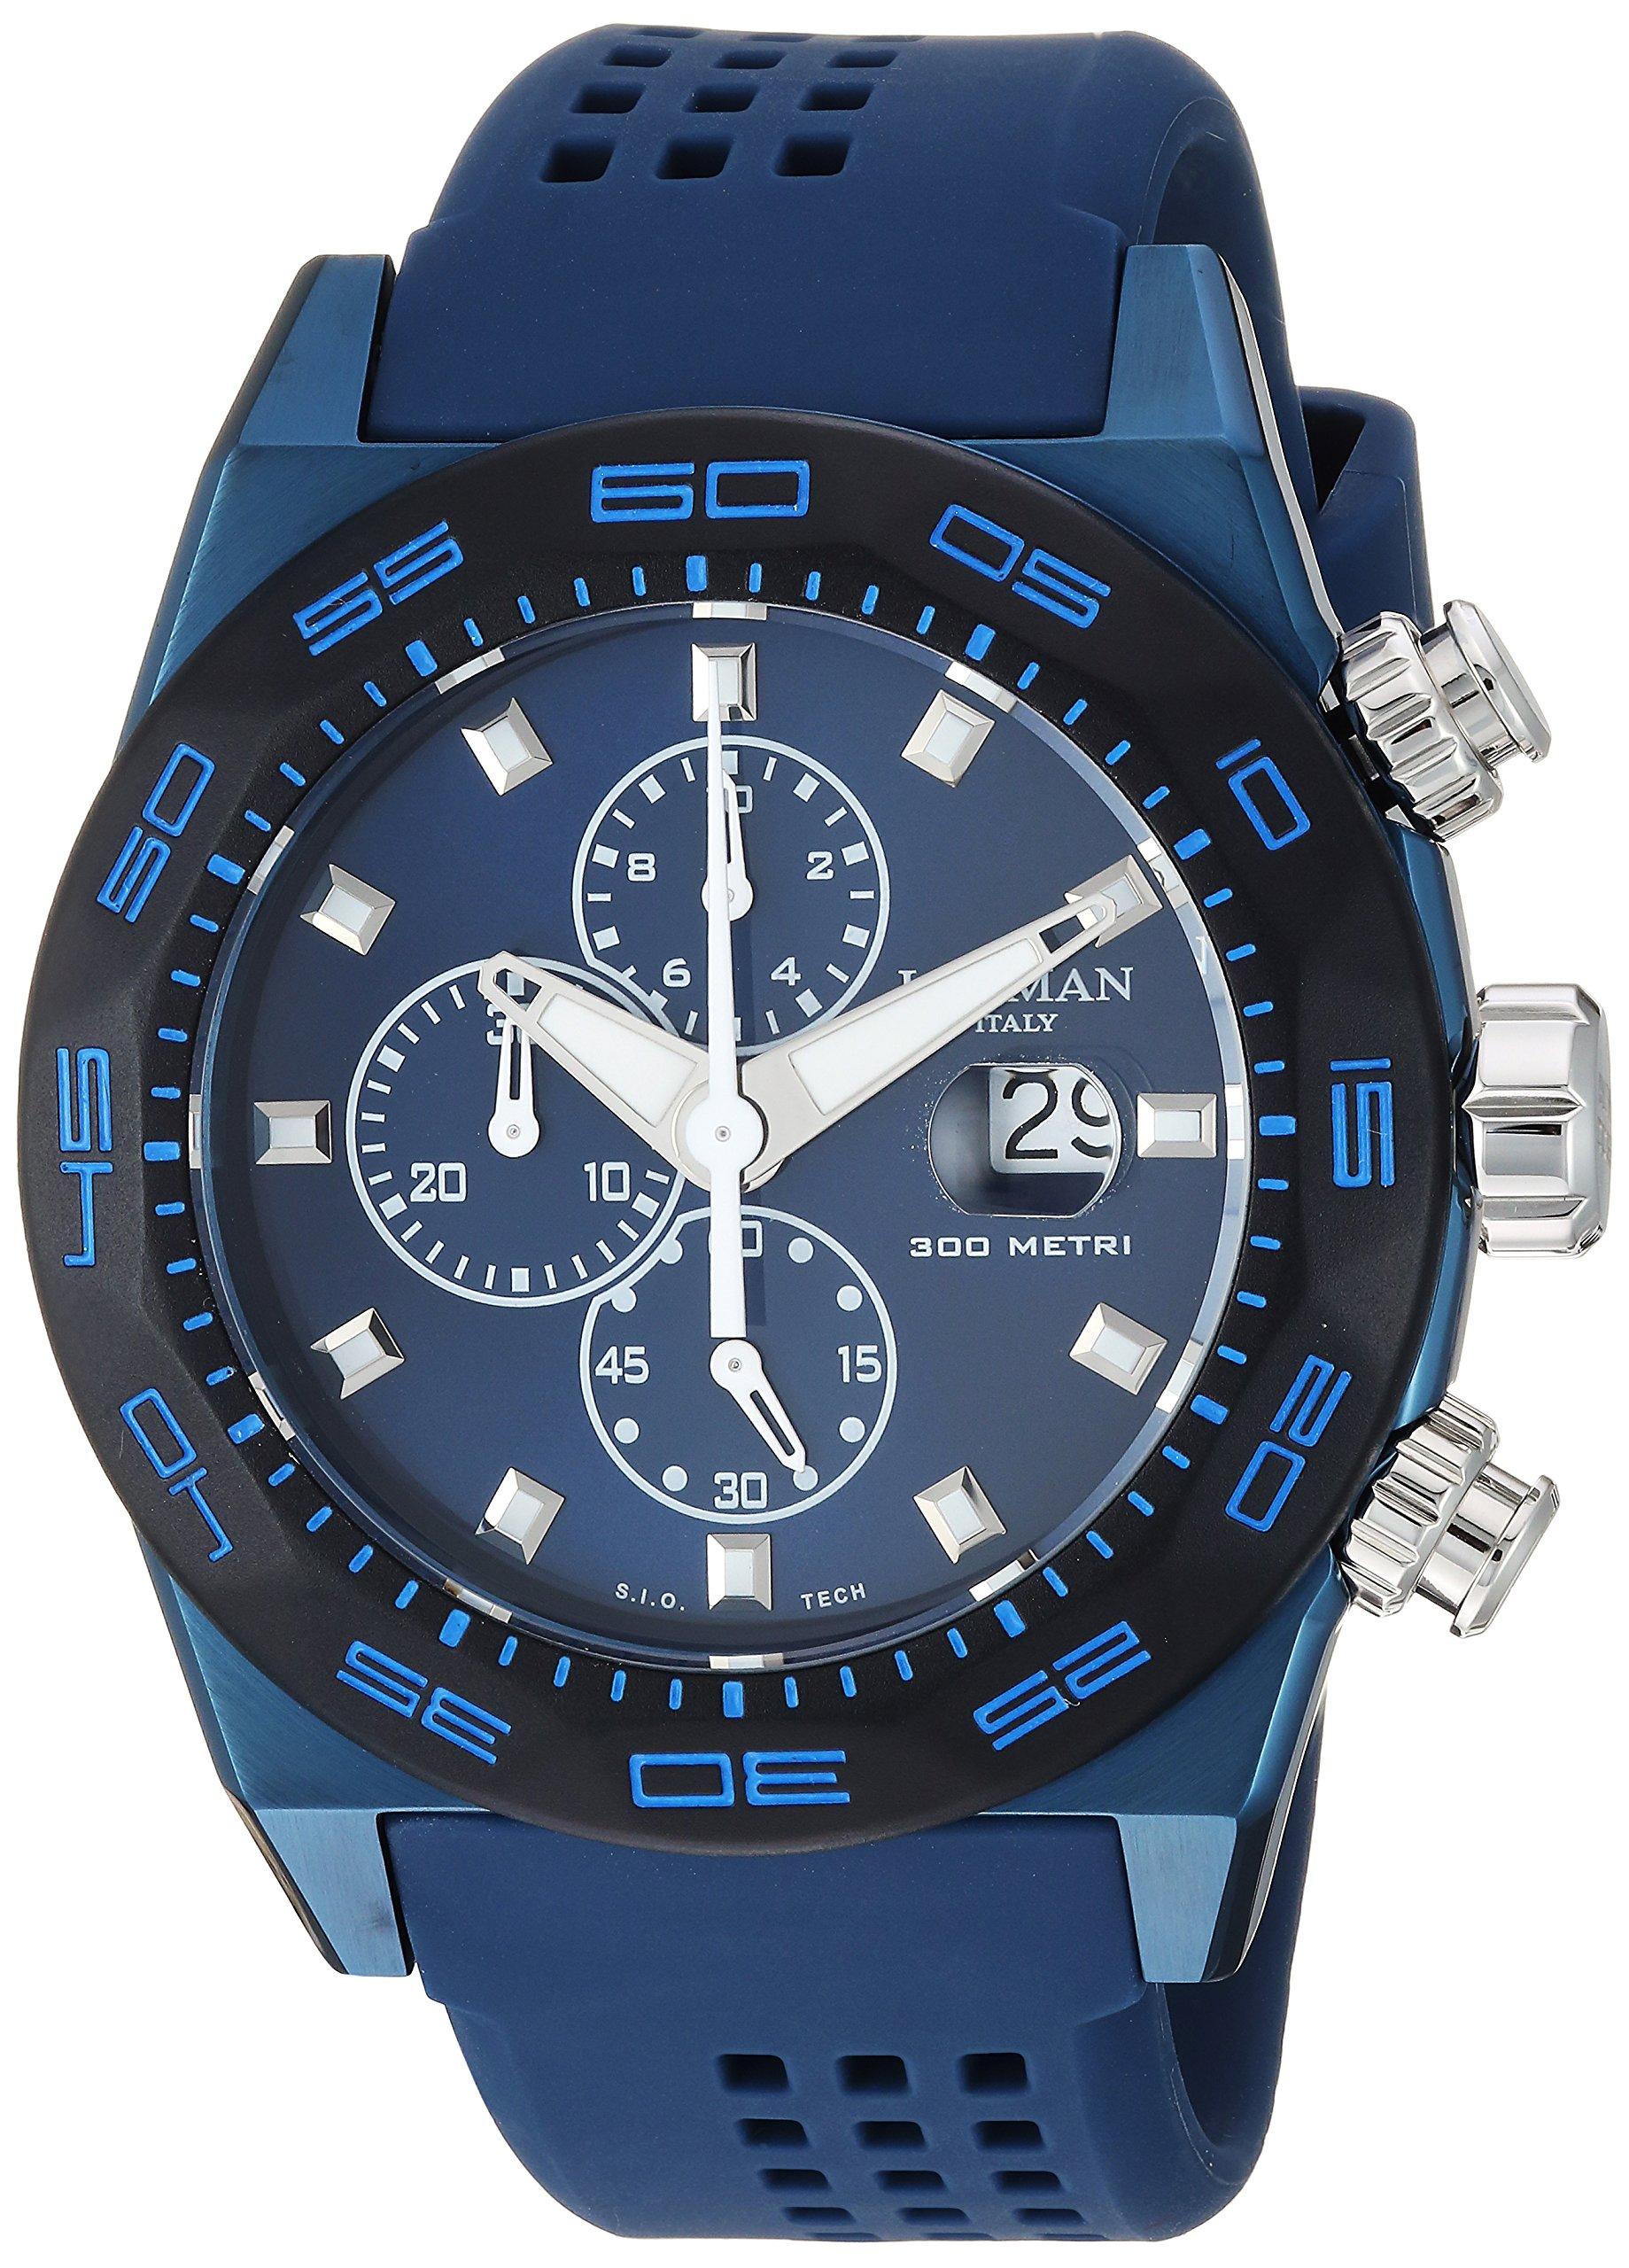 Locman Italy Men's 'Stealth 300 Metri' Quartz Stainless Steel and Rubber Diving Watch, Color:Blue (Model: 0217V4-BKBLNKS2B)